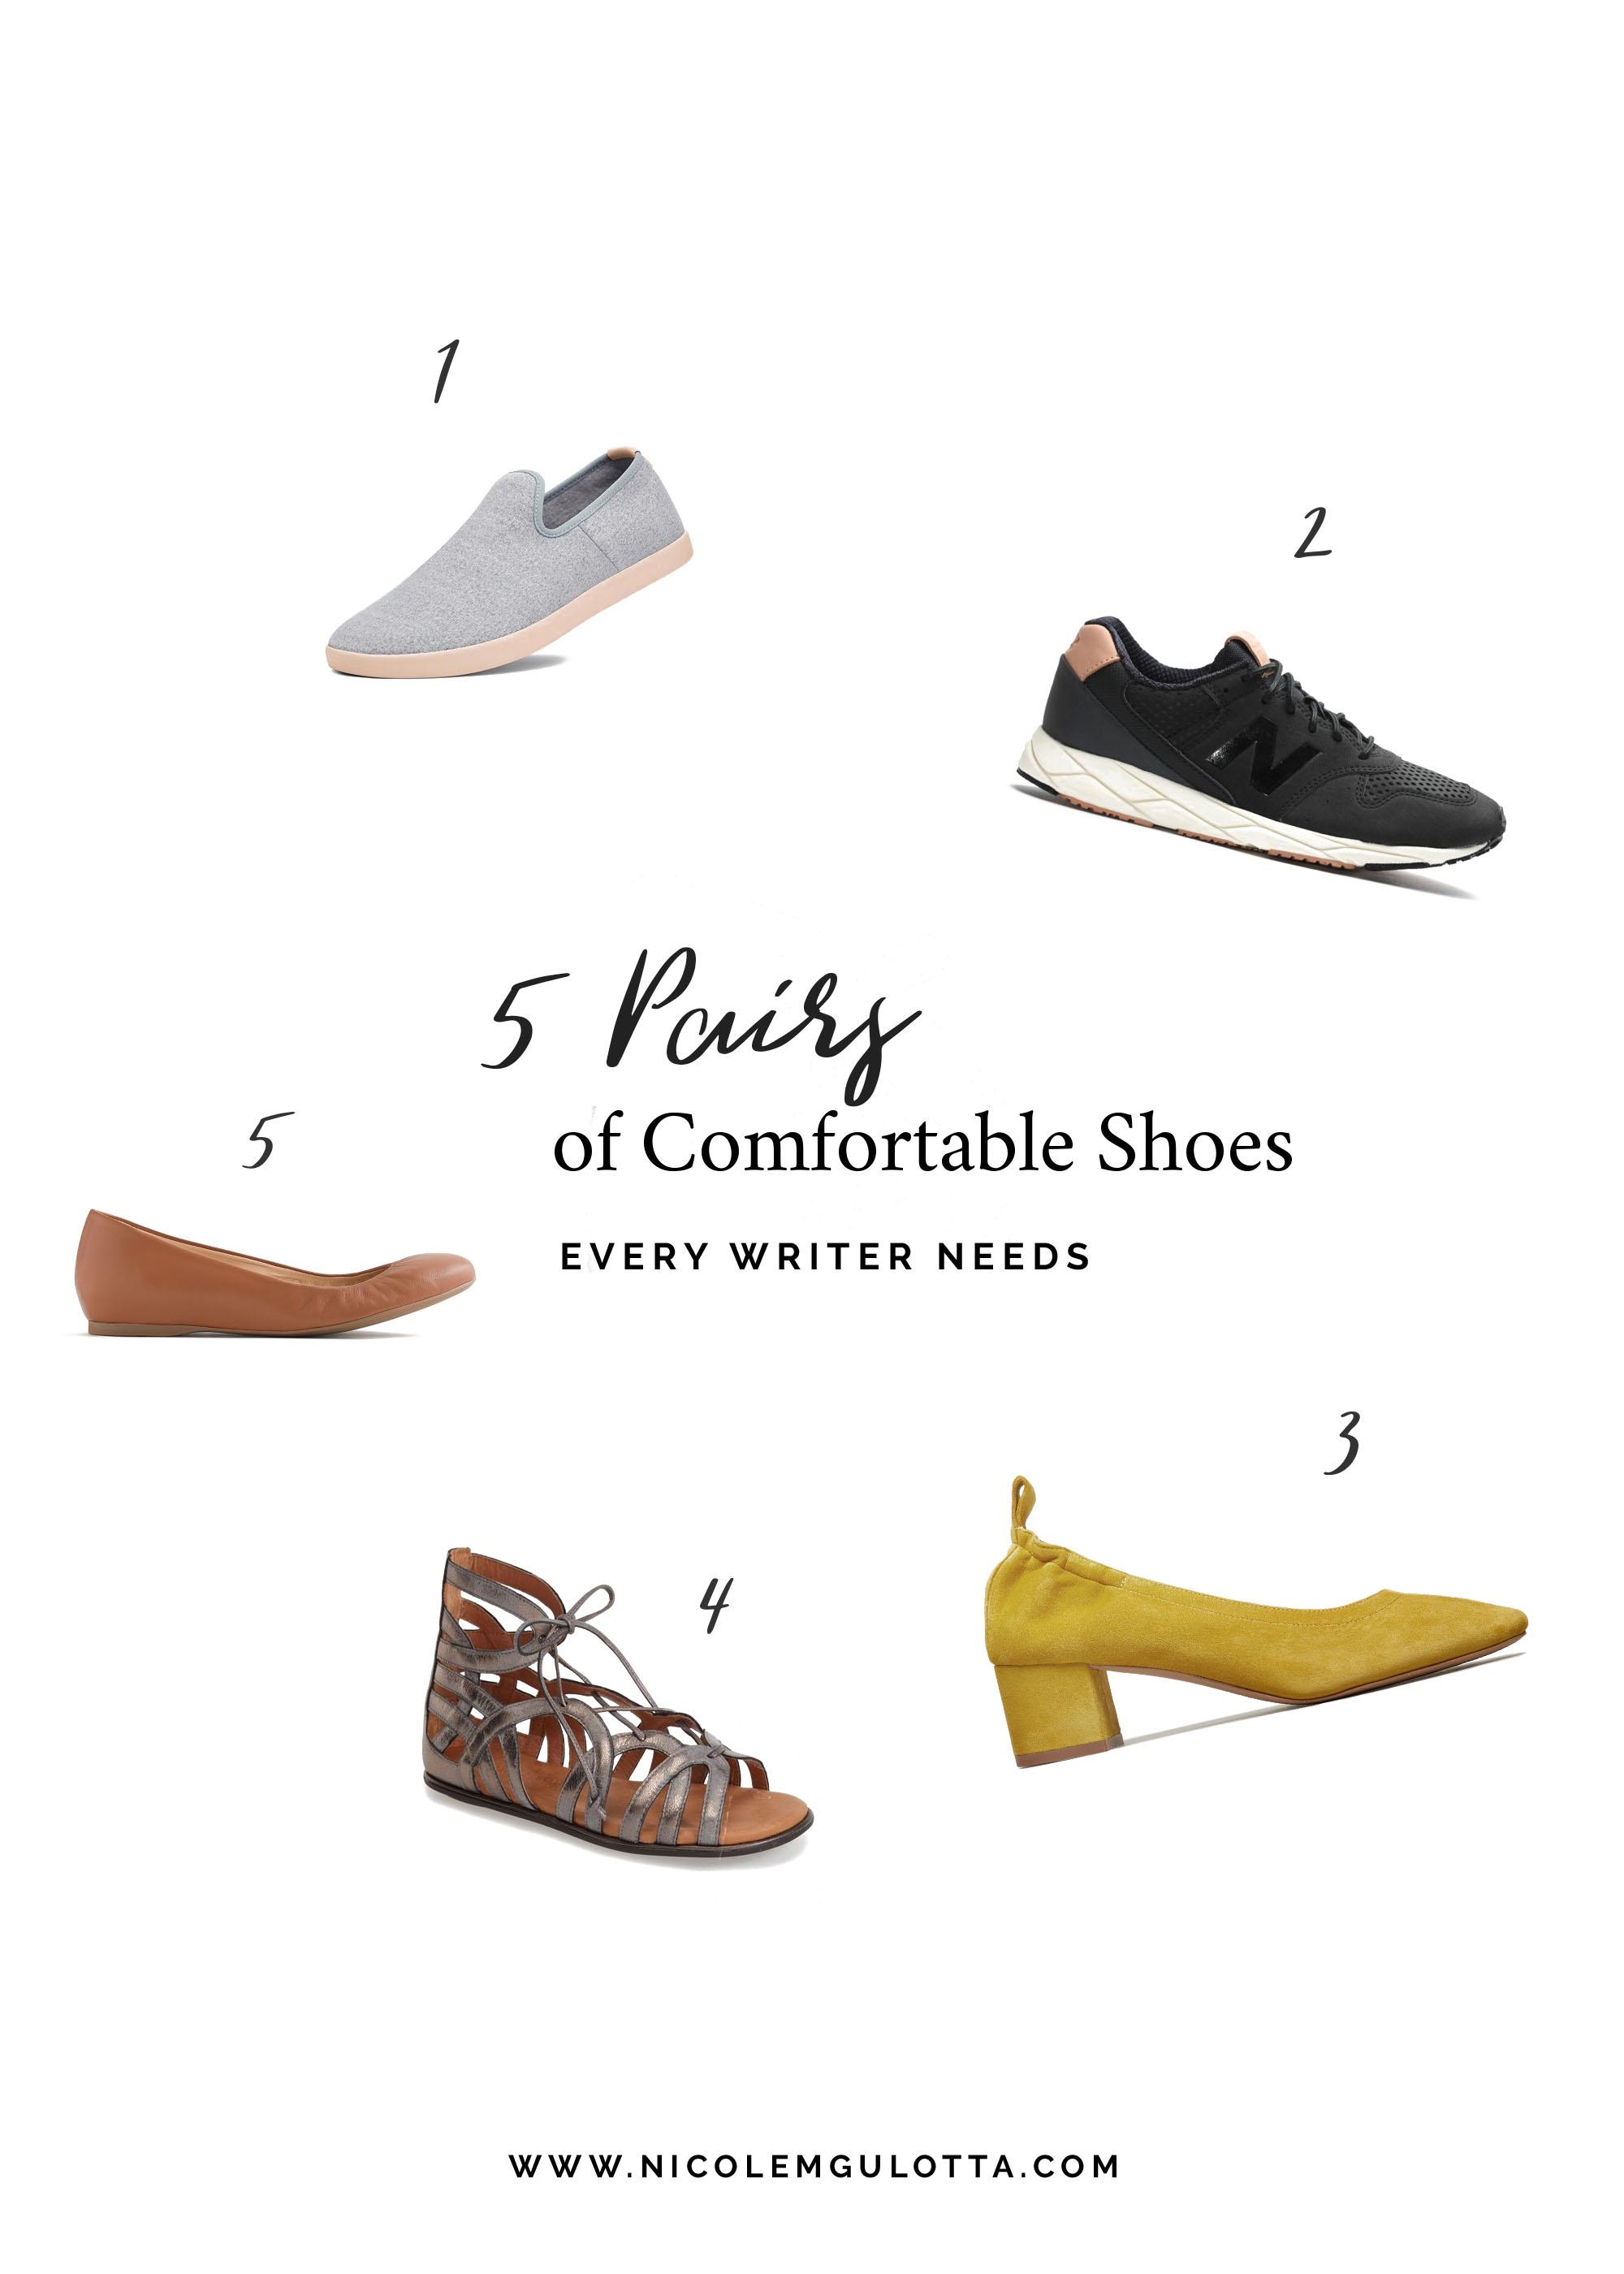 5 Favorite Shoes FINAL 2.jpg